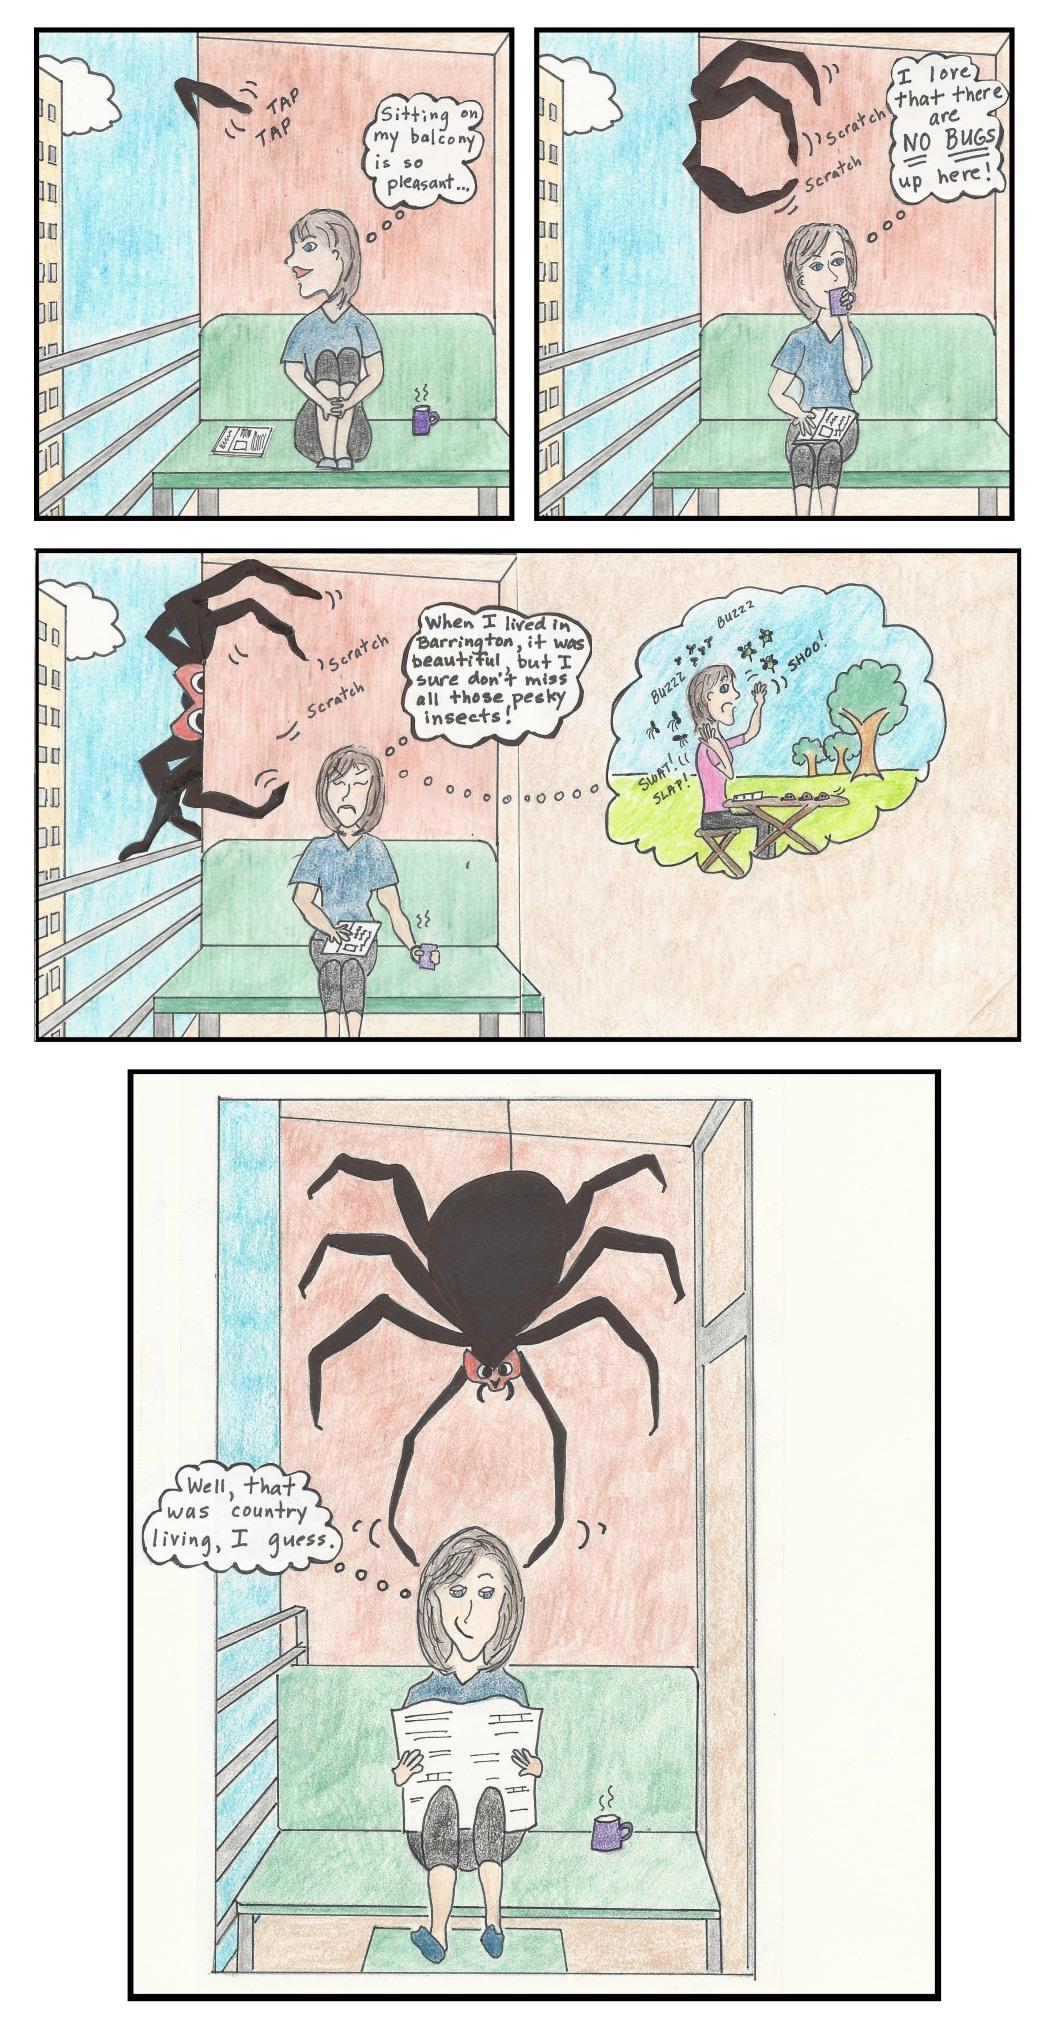 High Rise Spider Rev 2